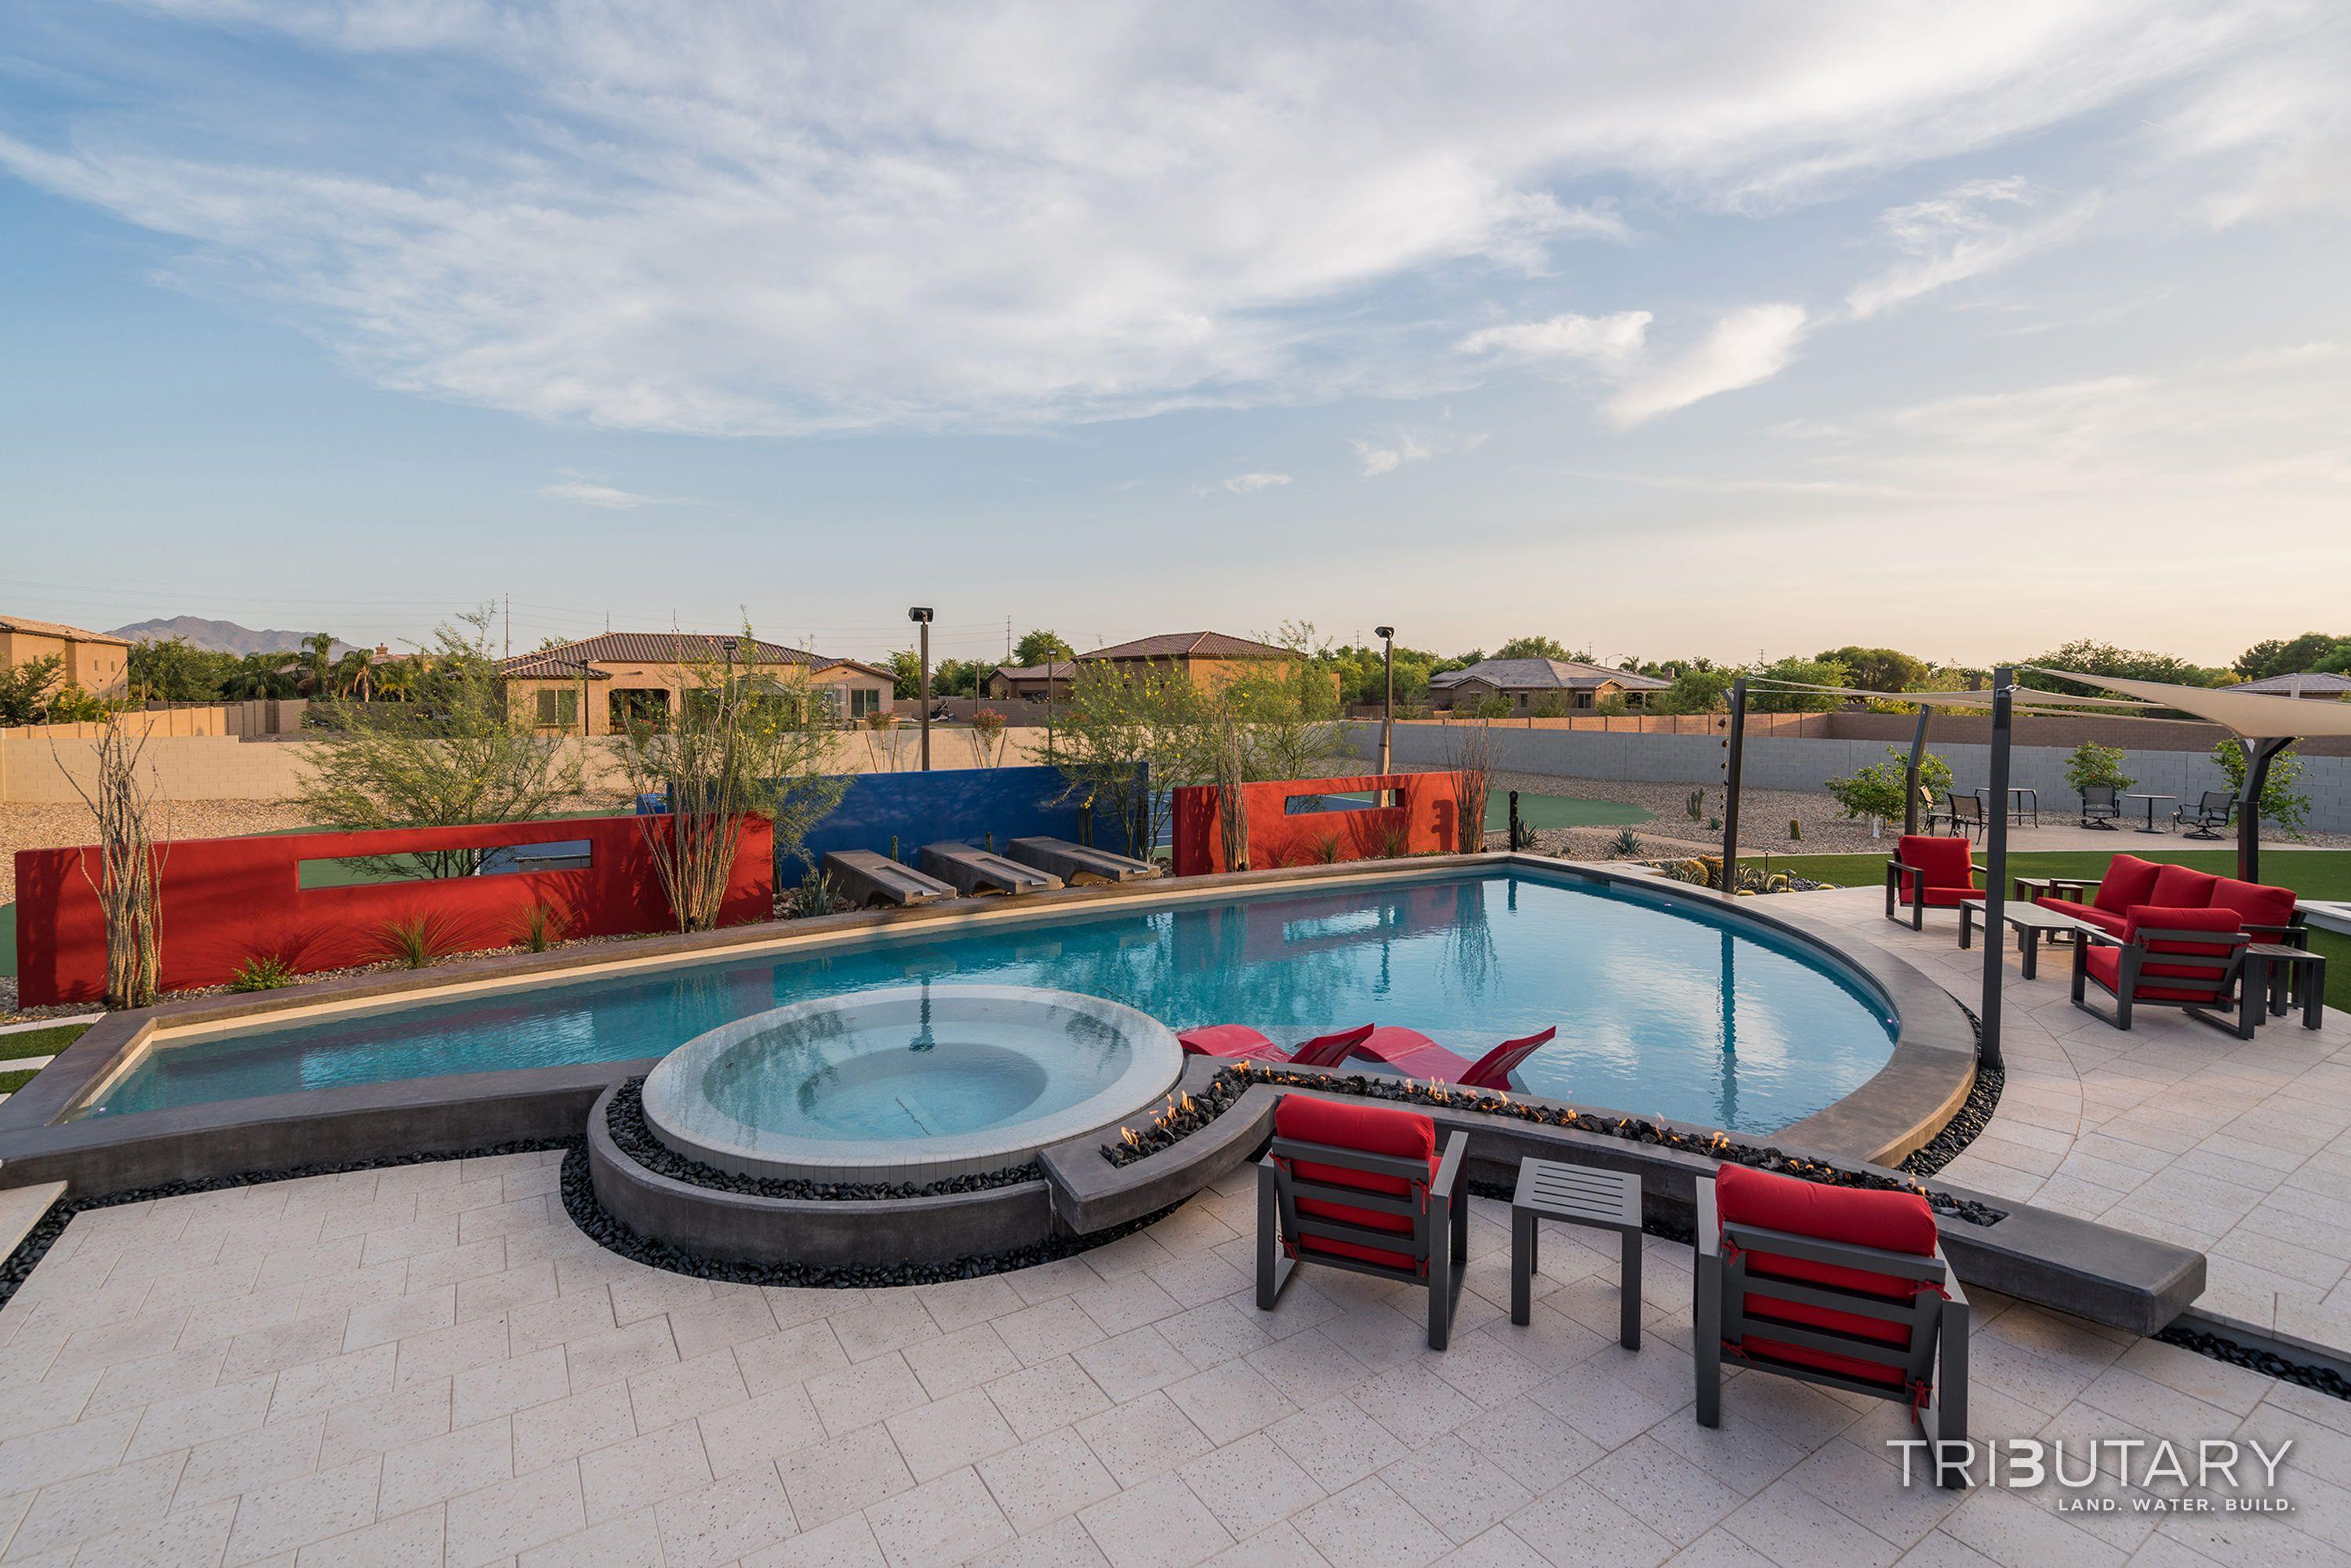 Tributary Pools Custom Pool Sleek Oasis Gilbert Diy Network Pool Kings Gilbert Arizona Paradise Luxury Pool Jeromey Naugle Watershapes